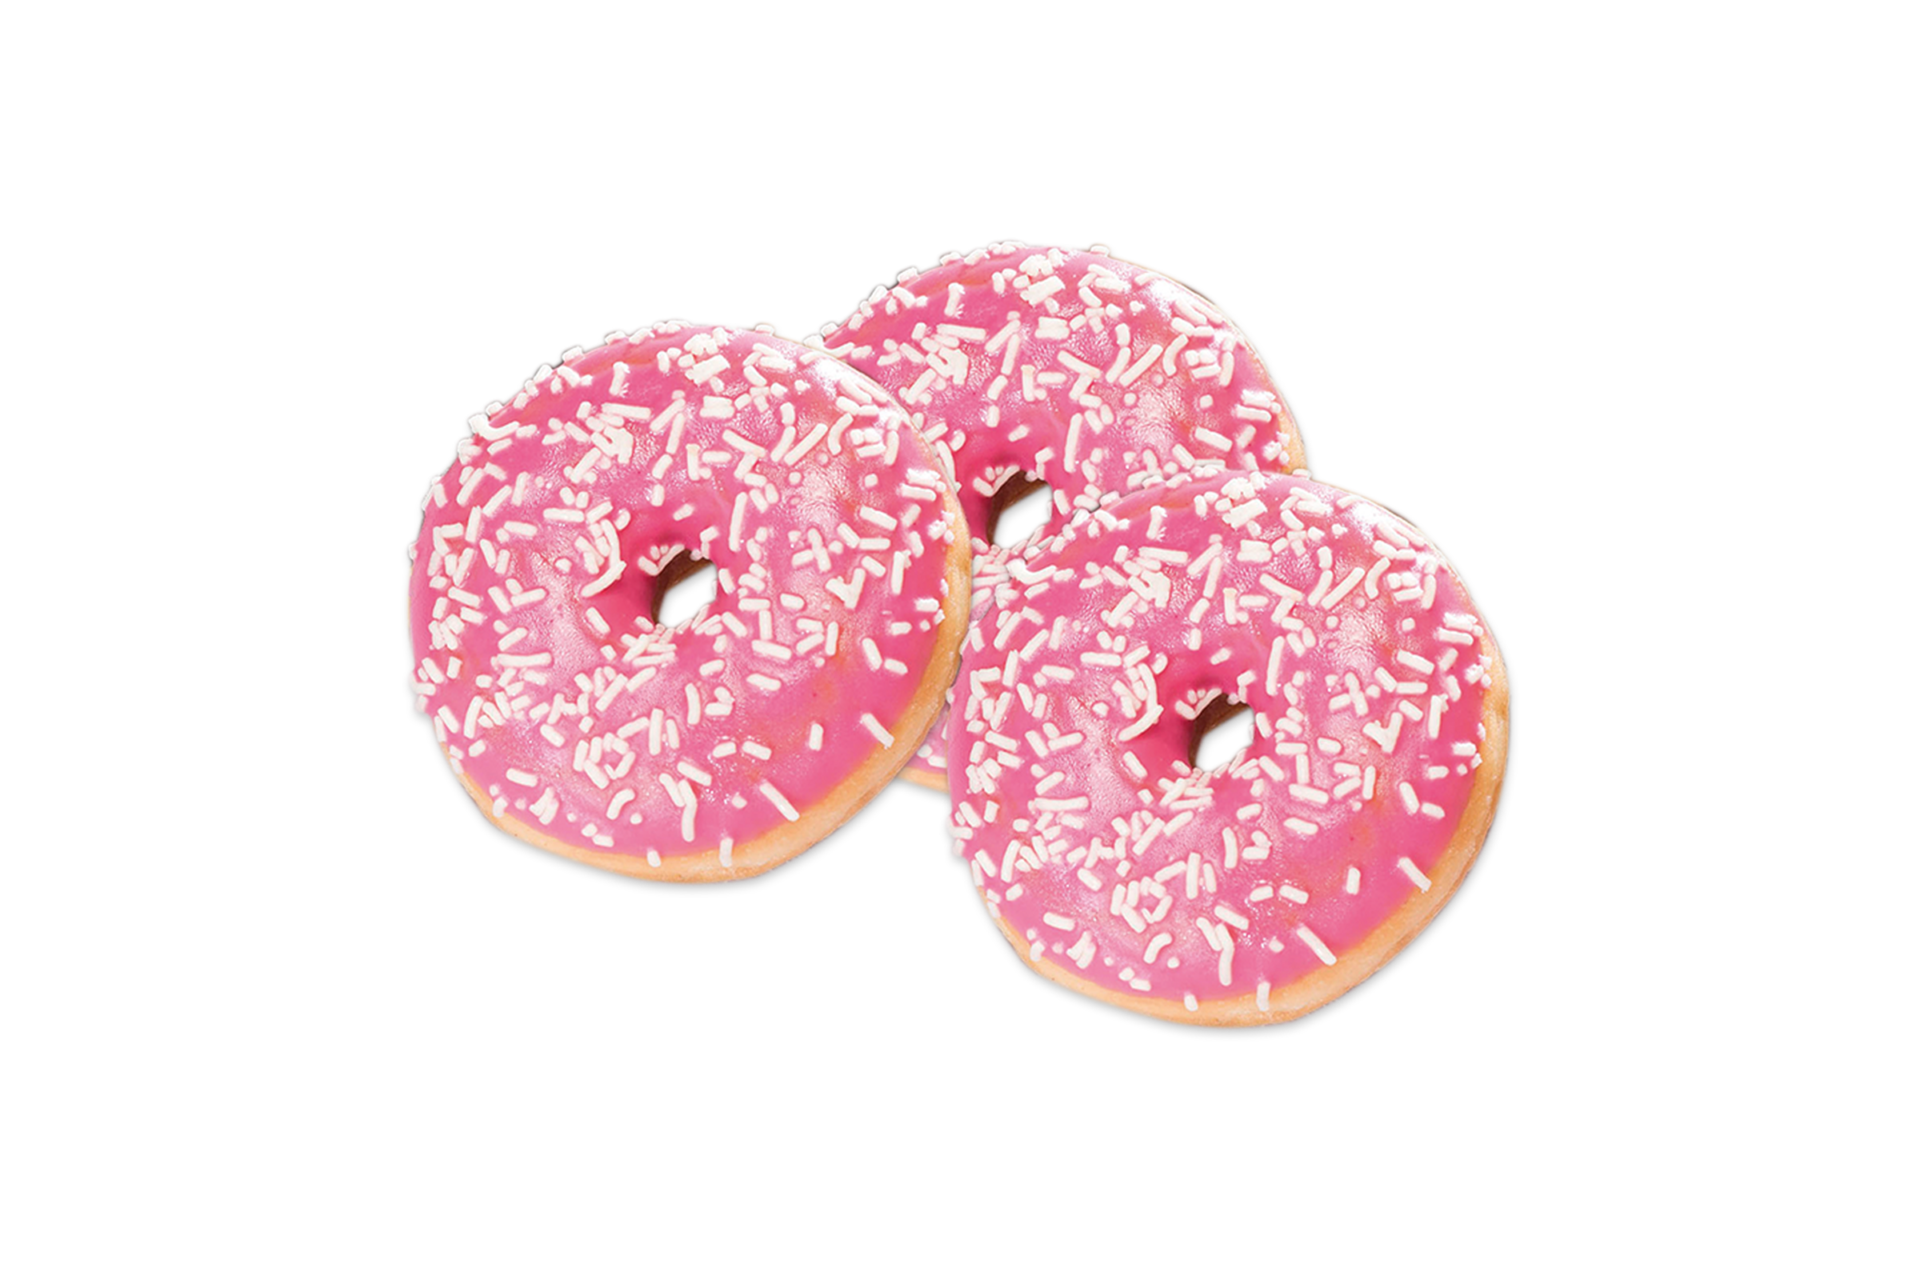 Mini Erdbeer Donut (3 Stk.) 1